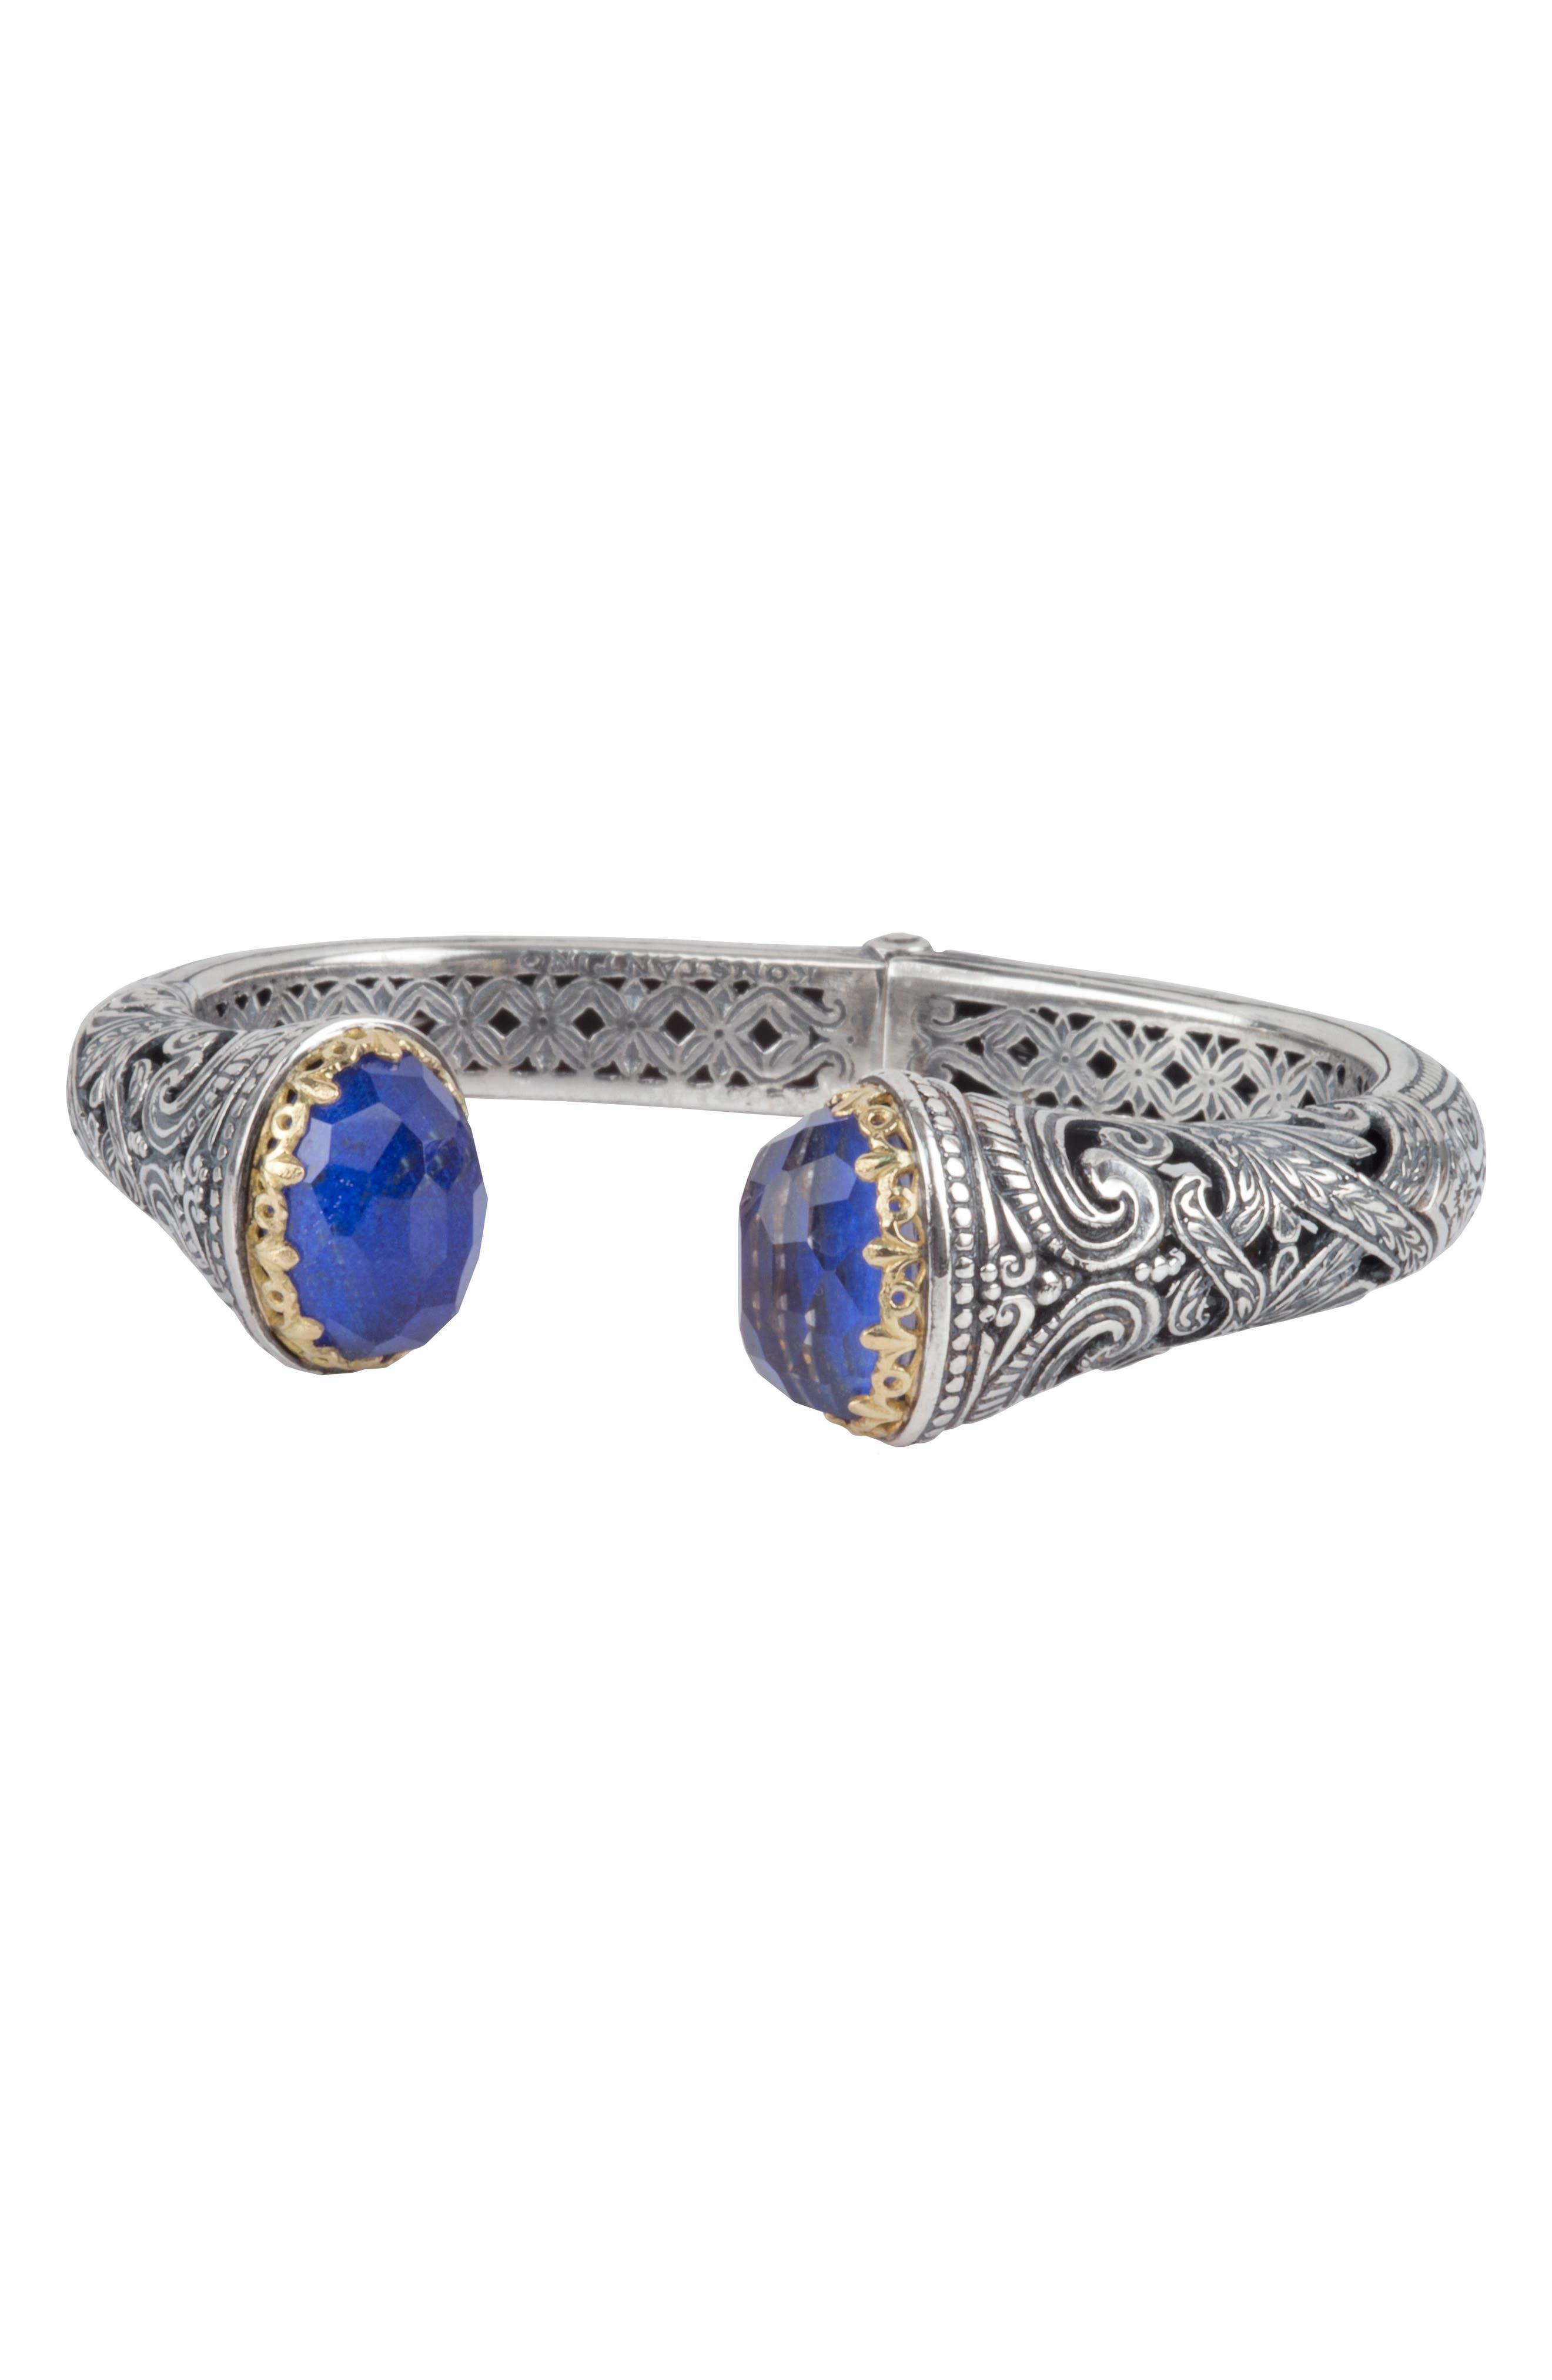 Main Image - Konstantino Andromeda Lapis Lazuli Hinge Cuff